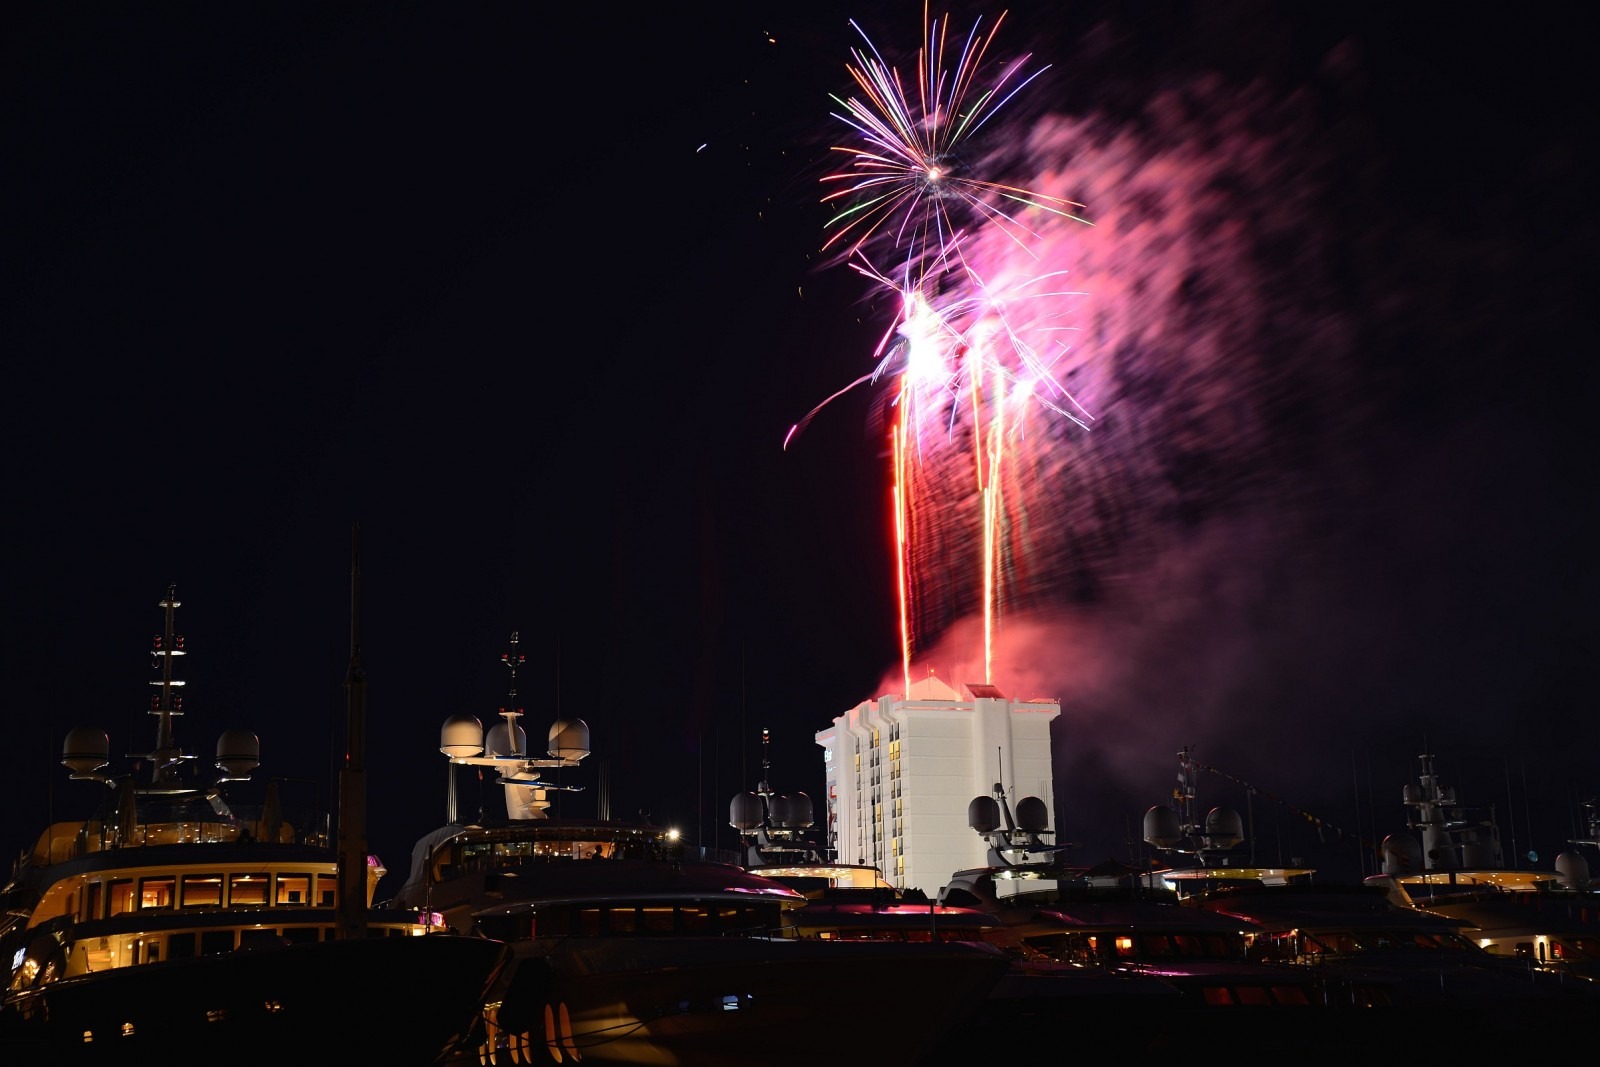 Th Fireworks - DSC_9261.NEF